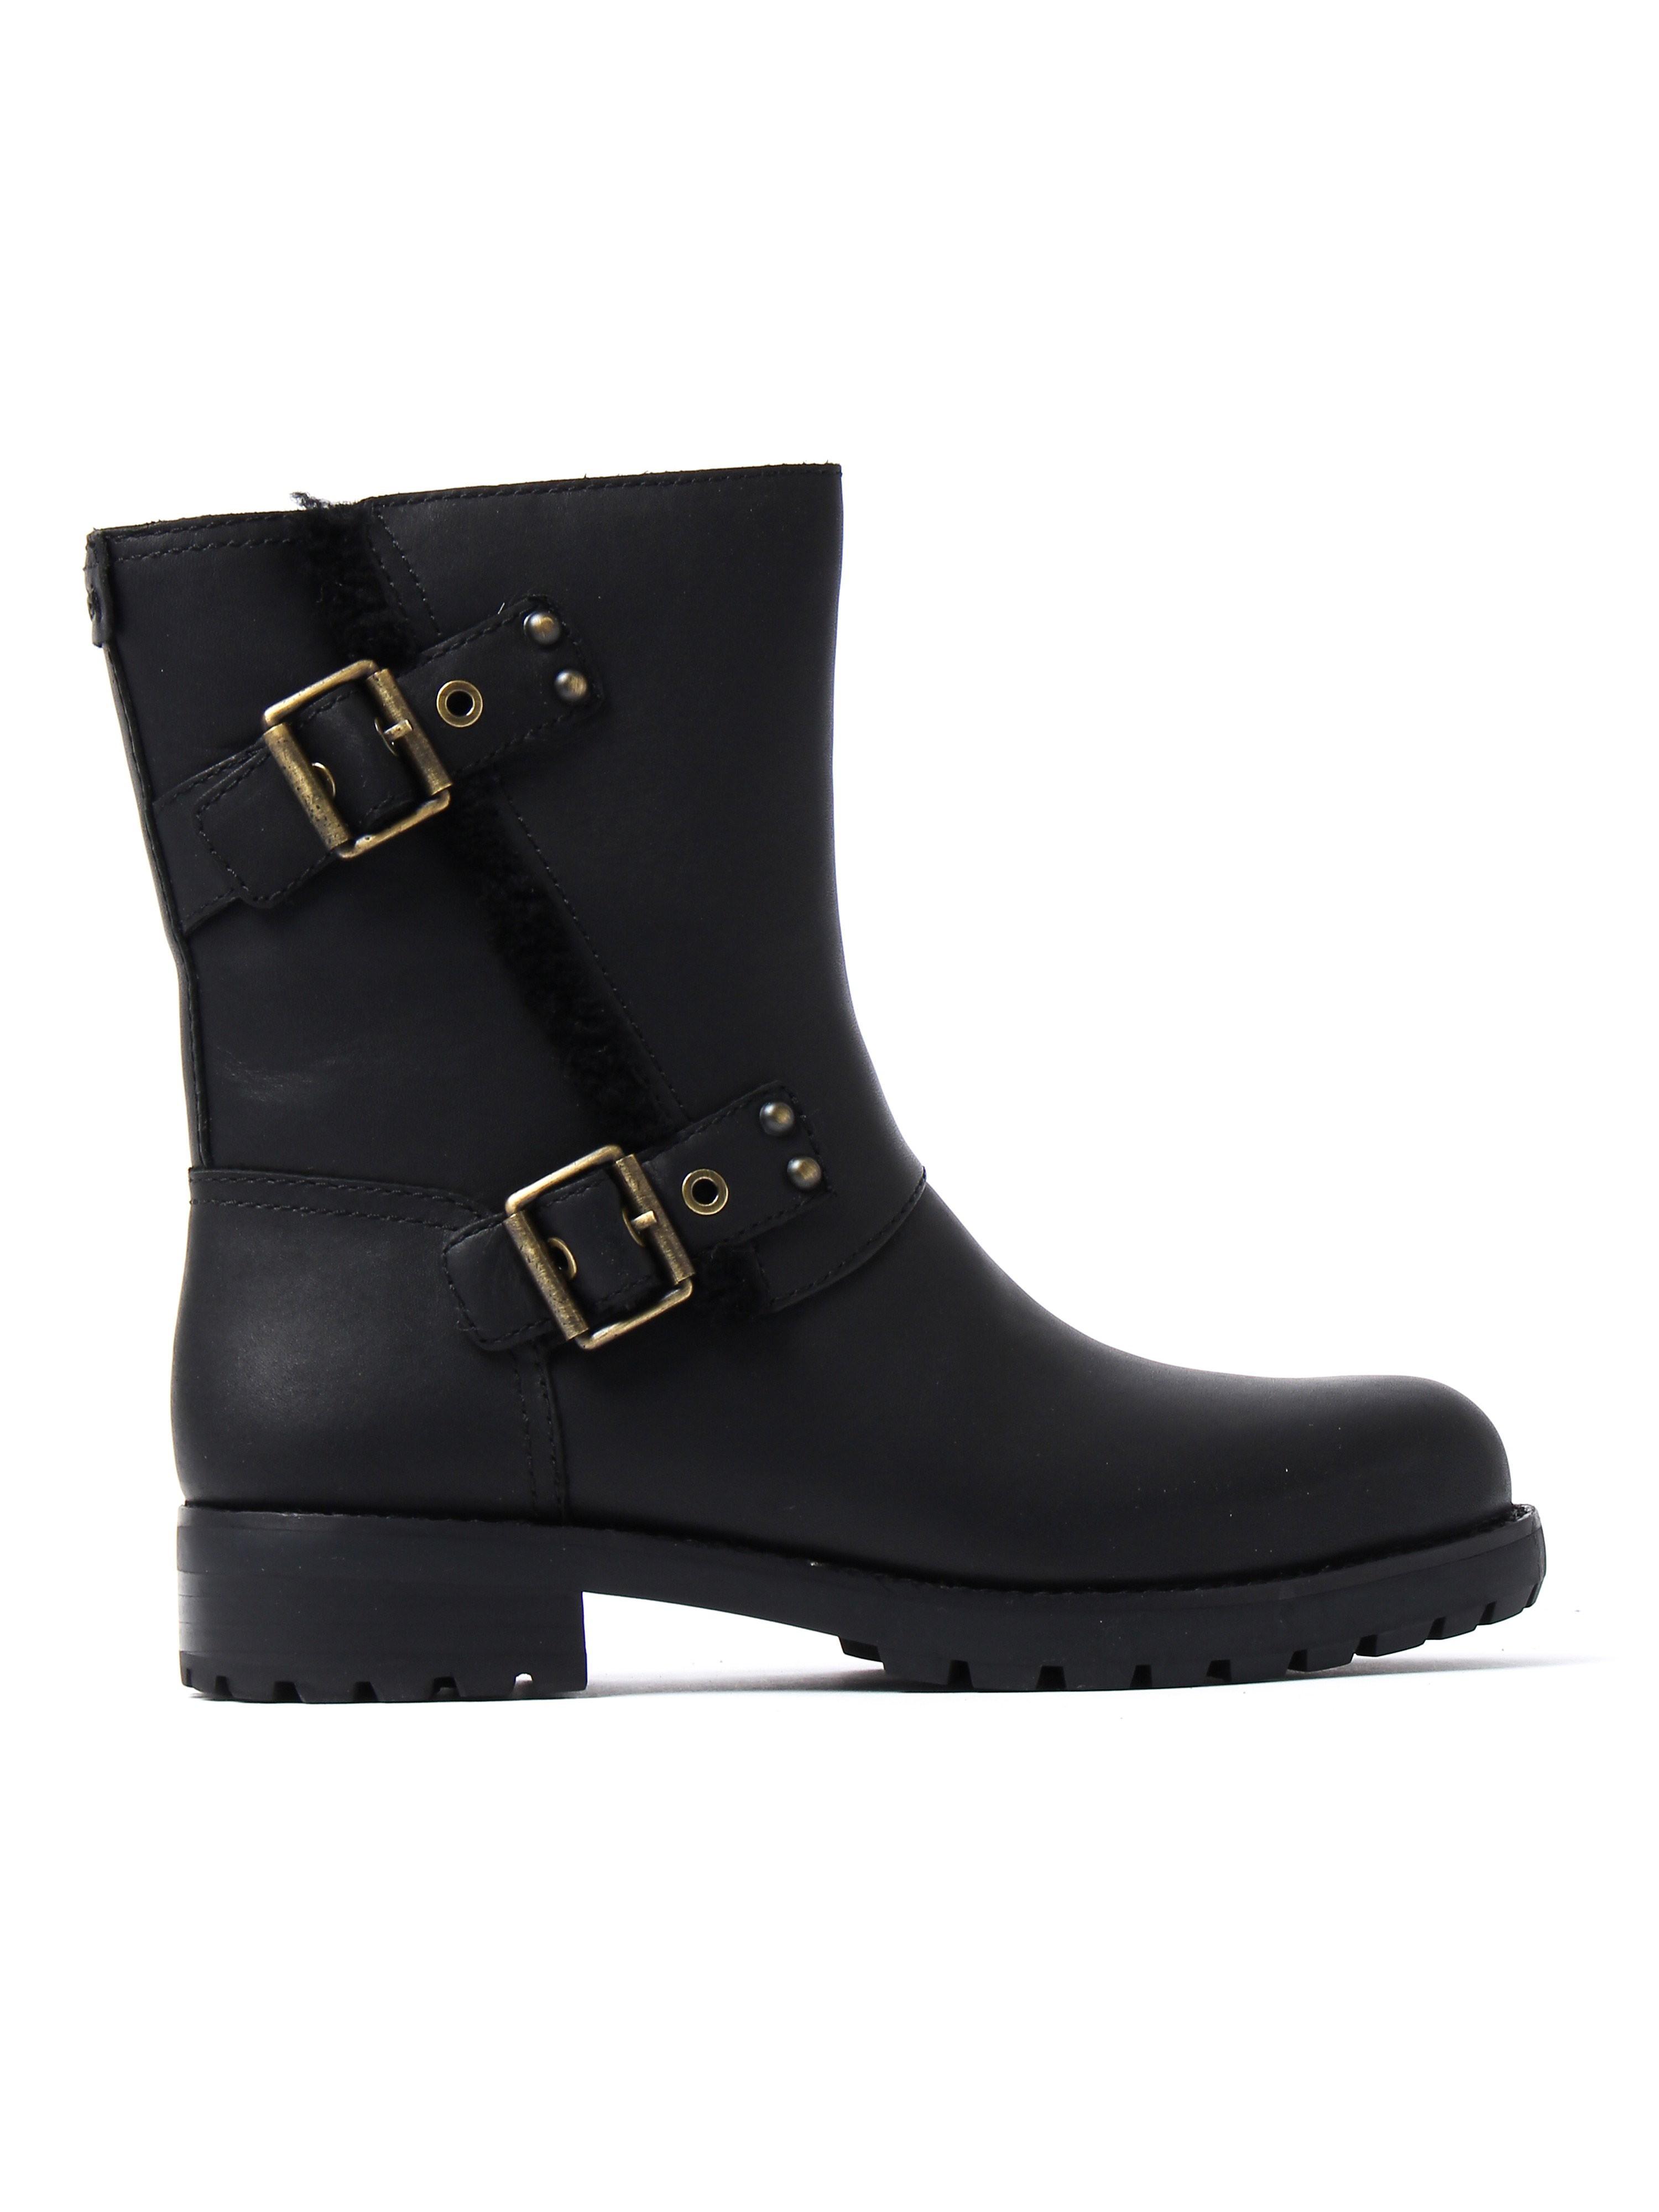 UGG Women's Niels Biker Boots - Black Leather